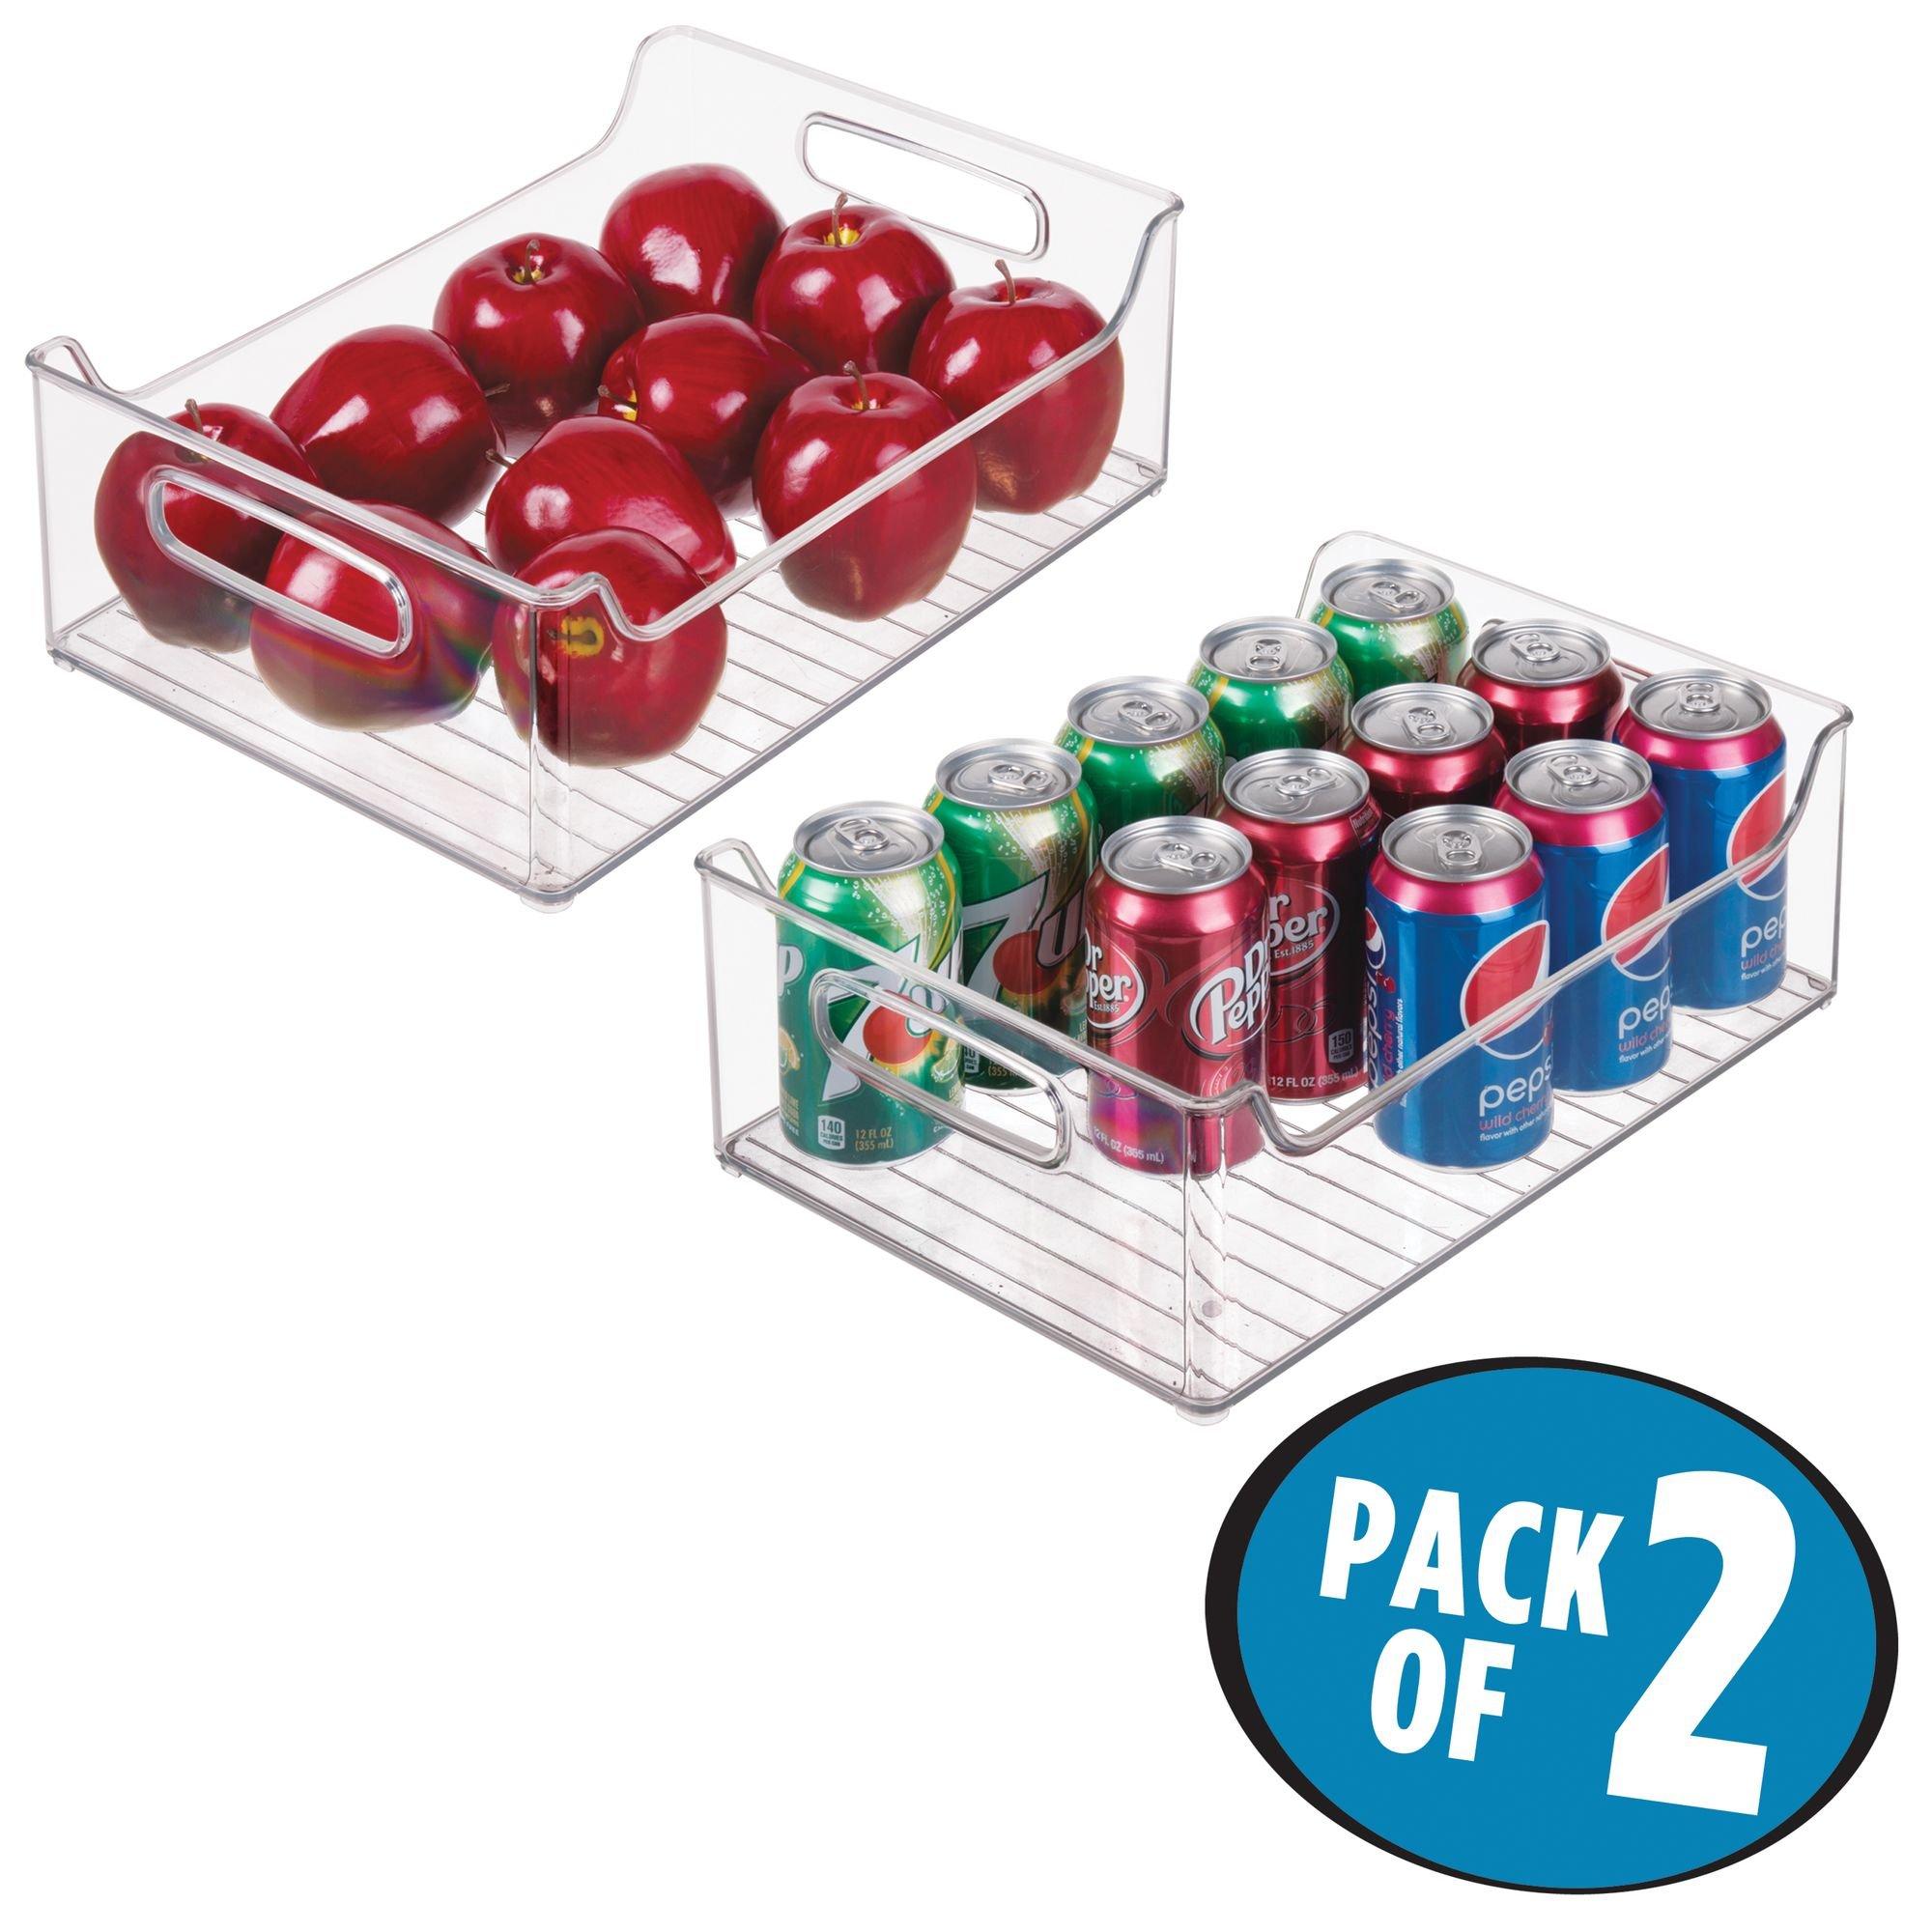 mDesign Plastic Kitchen Pantry Cabinet, Refrigerator or Freezer Food Storage Bins with Handles - Organizer for Fruit, Yogurt, Snacks, Pasta - Food Safe, BPA Free, 14'' Long - 2 Pack, Clear